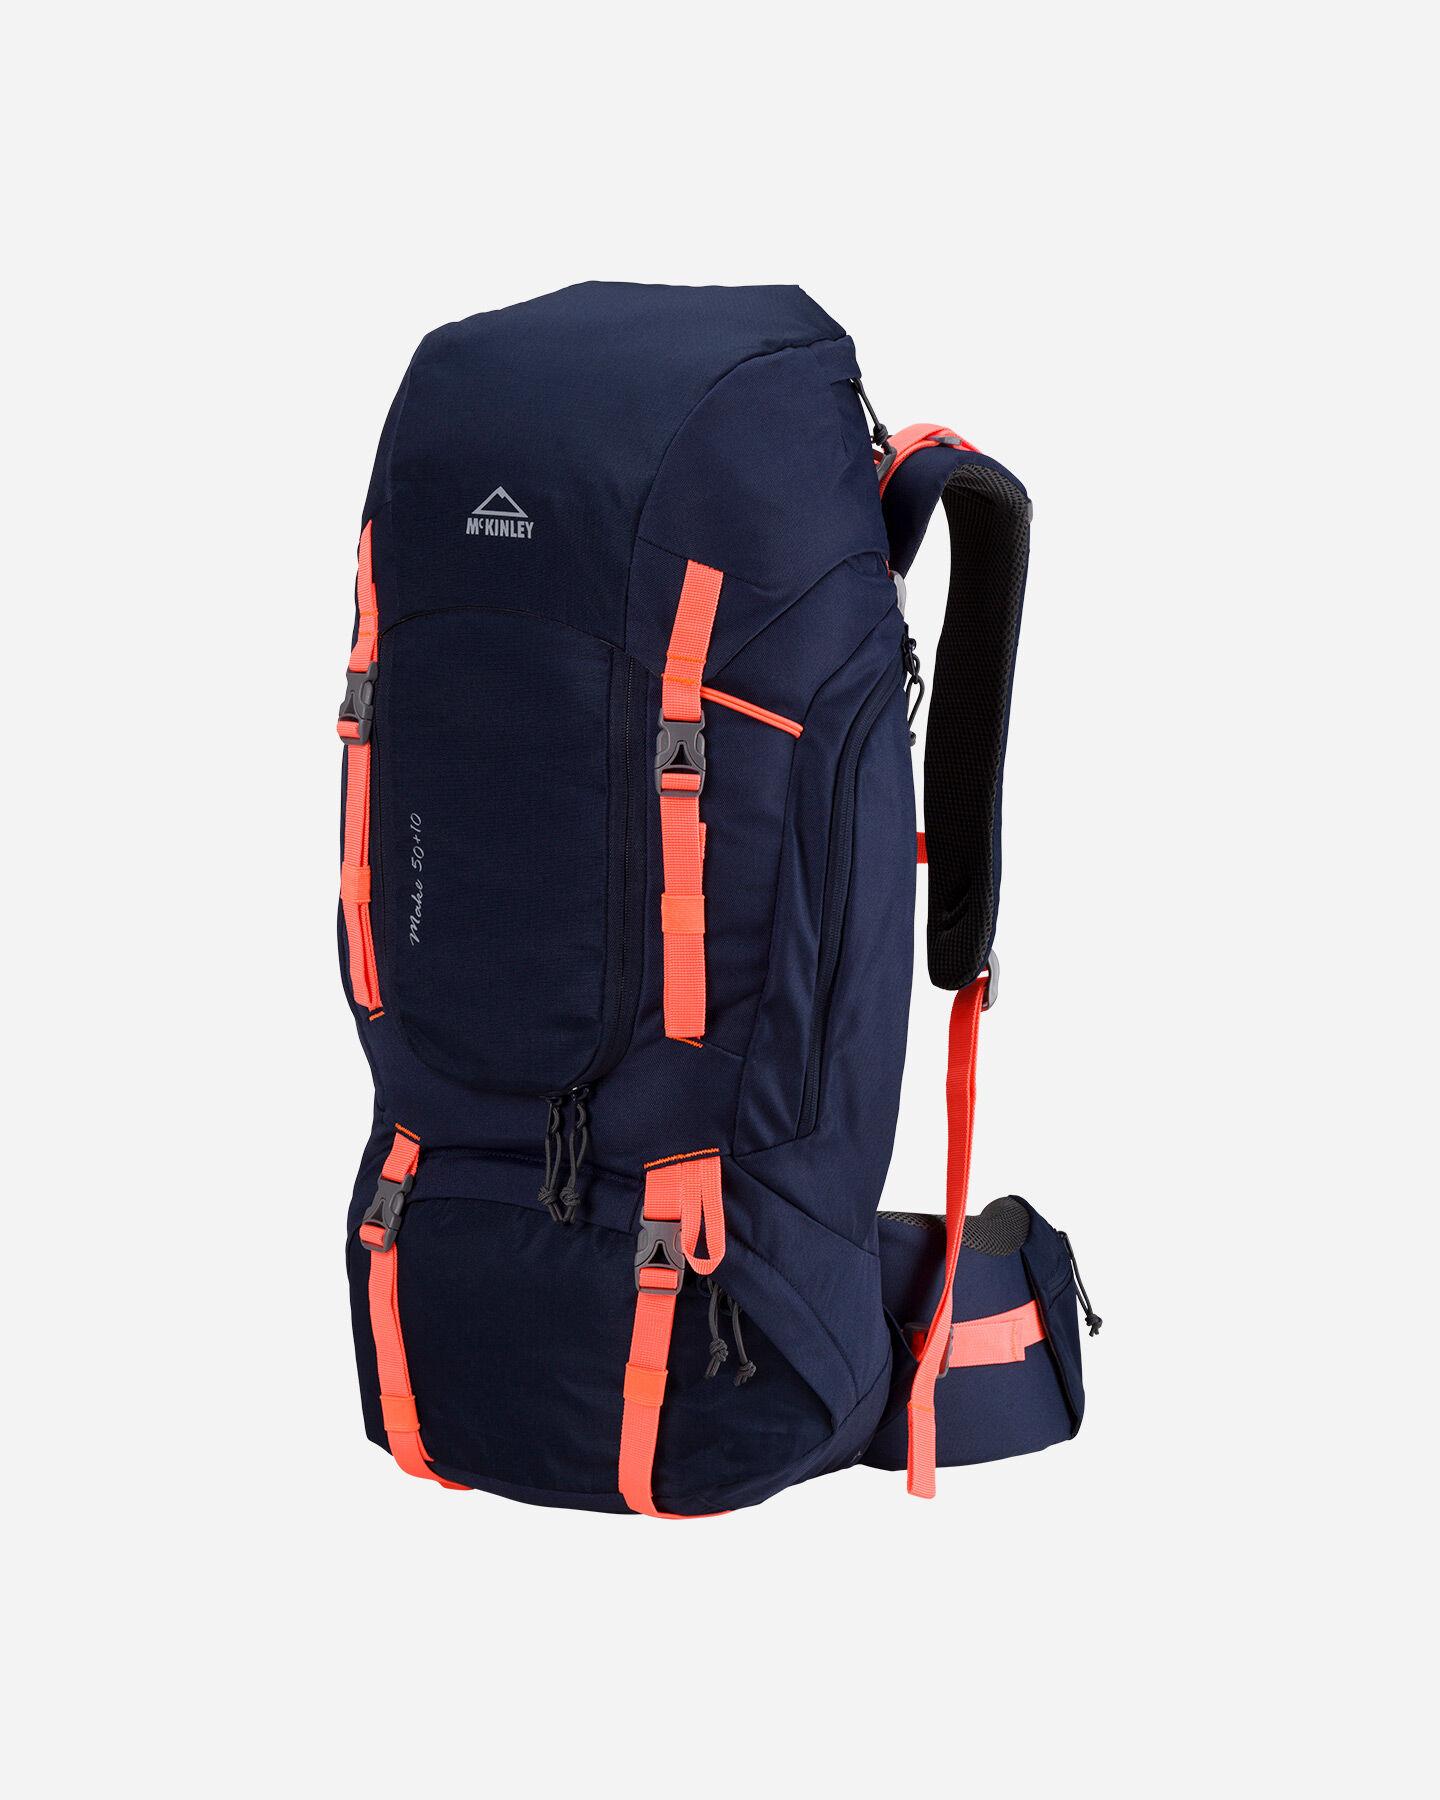 Zaino trekking MCKINLEY MAKE 50+10 RC S2001466|901|50 scatto 0